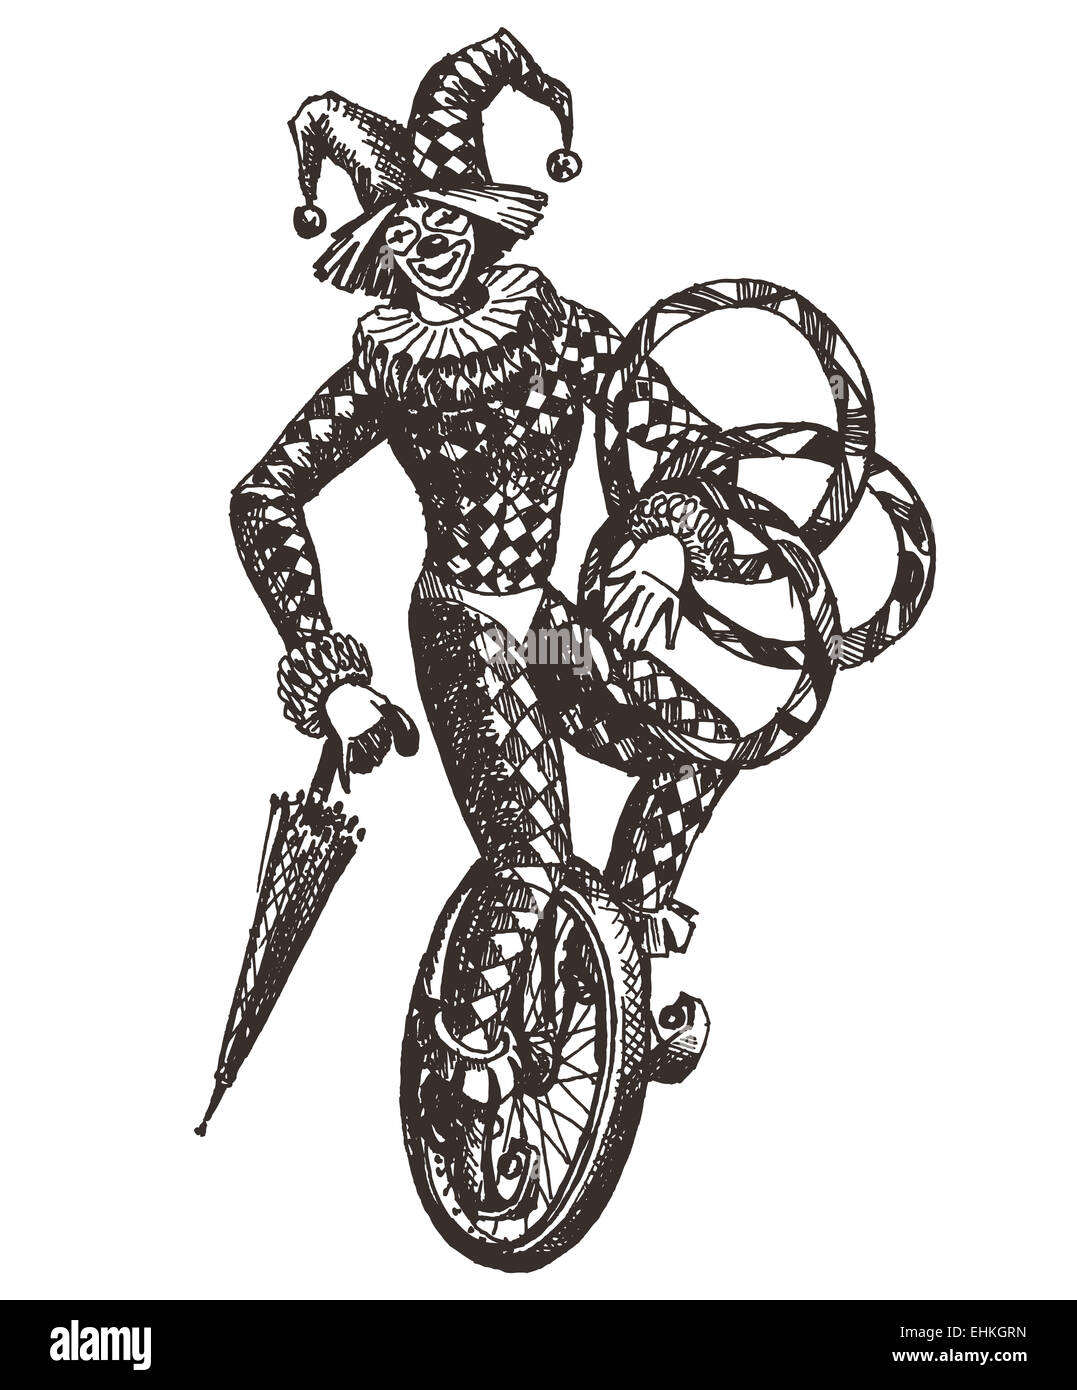 Bike stickers design joker - Clown Circus Joker On A White Background Illustration Sketch Stock Image